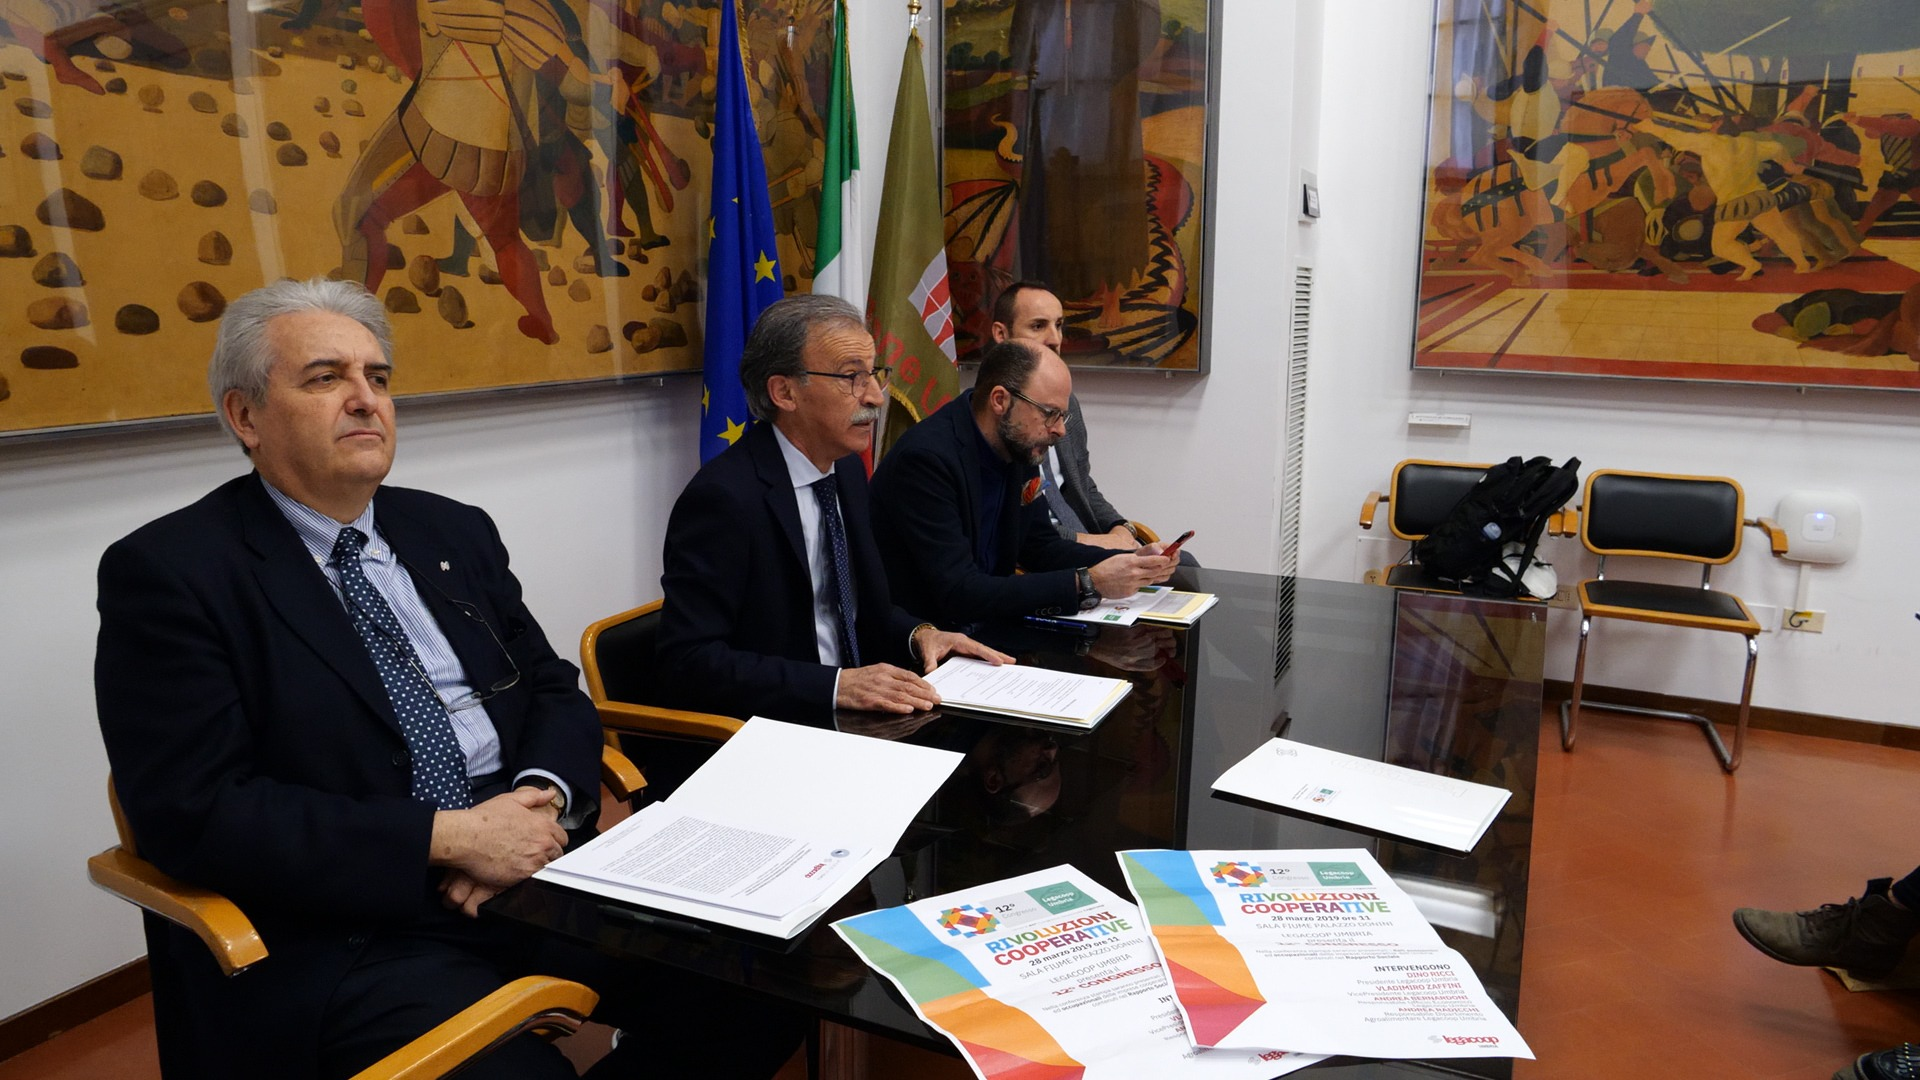 Legacoop Umbria | PRESENTATO A PERUGIA IL 12° CONGRESSO ...